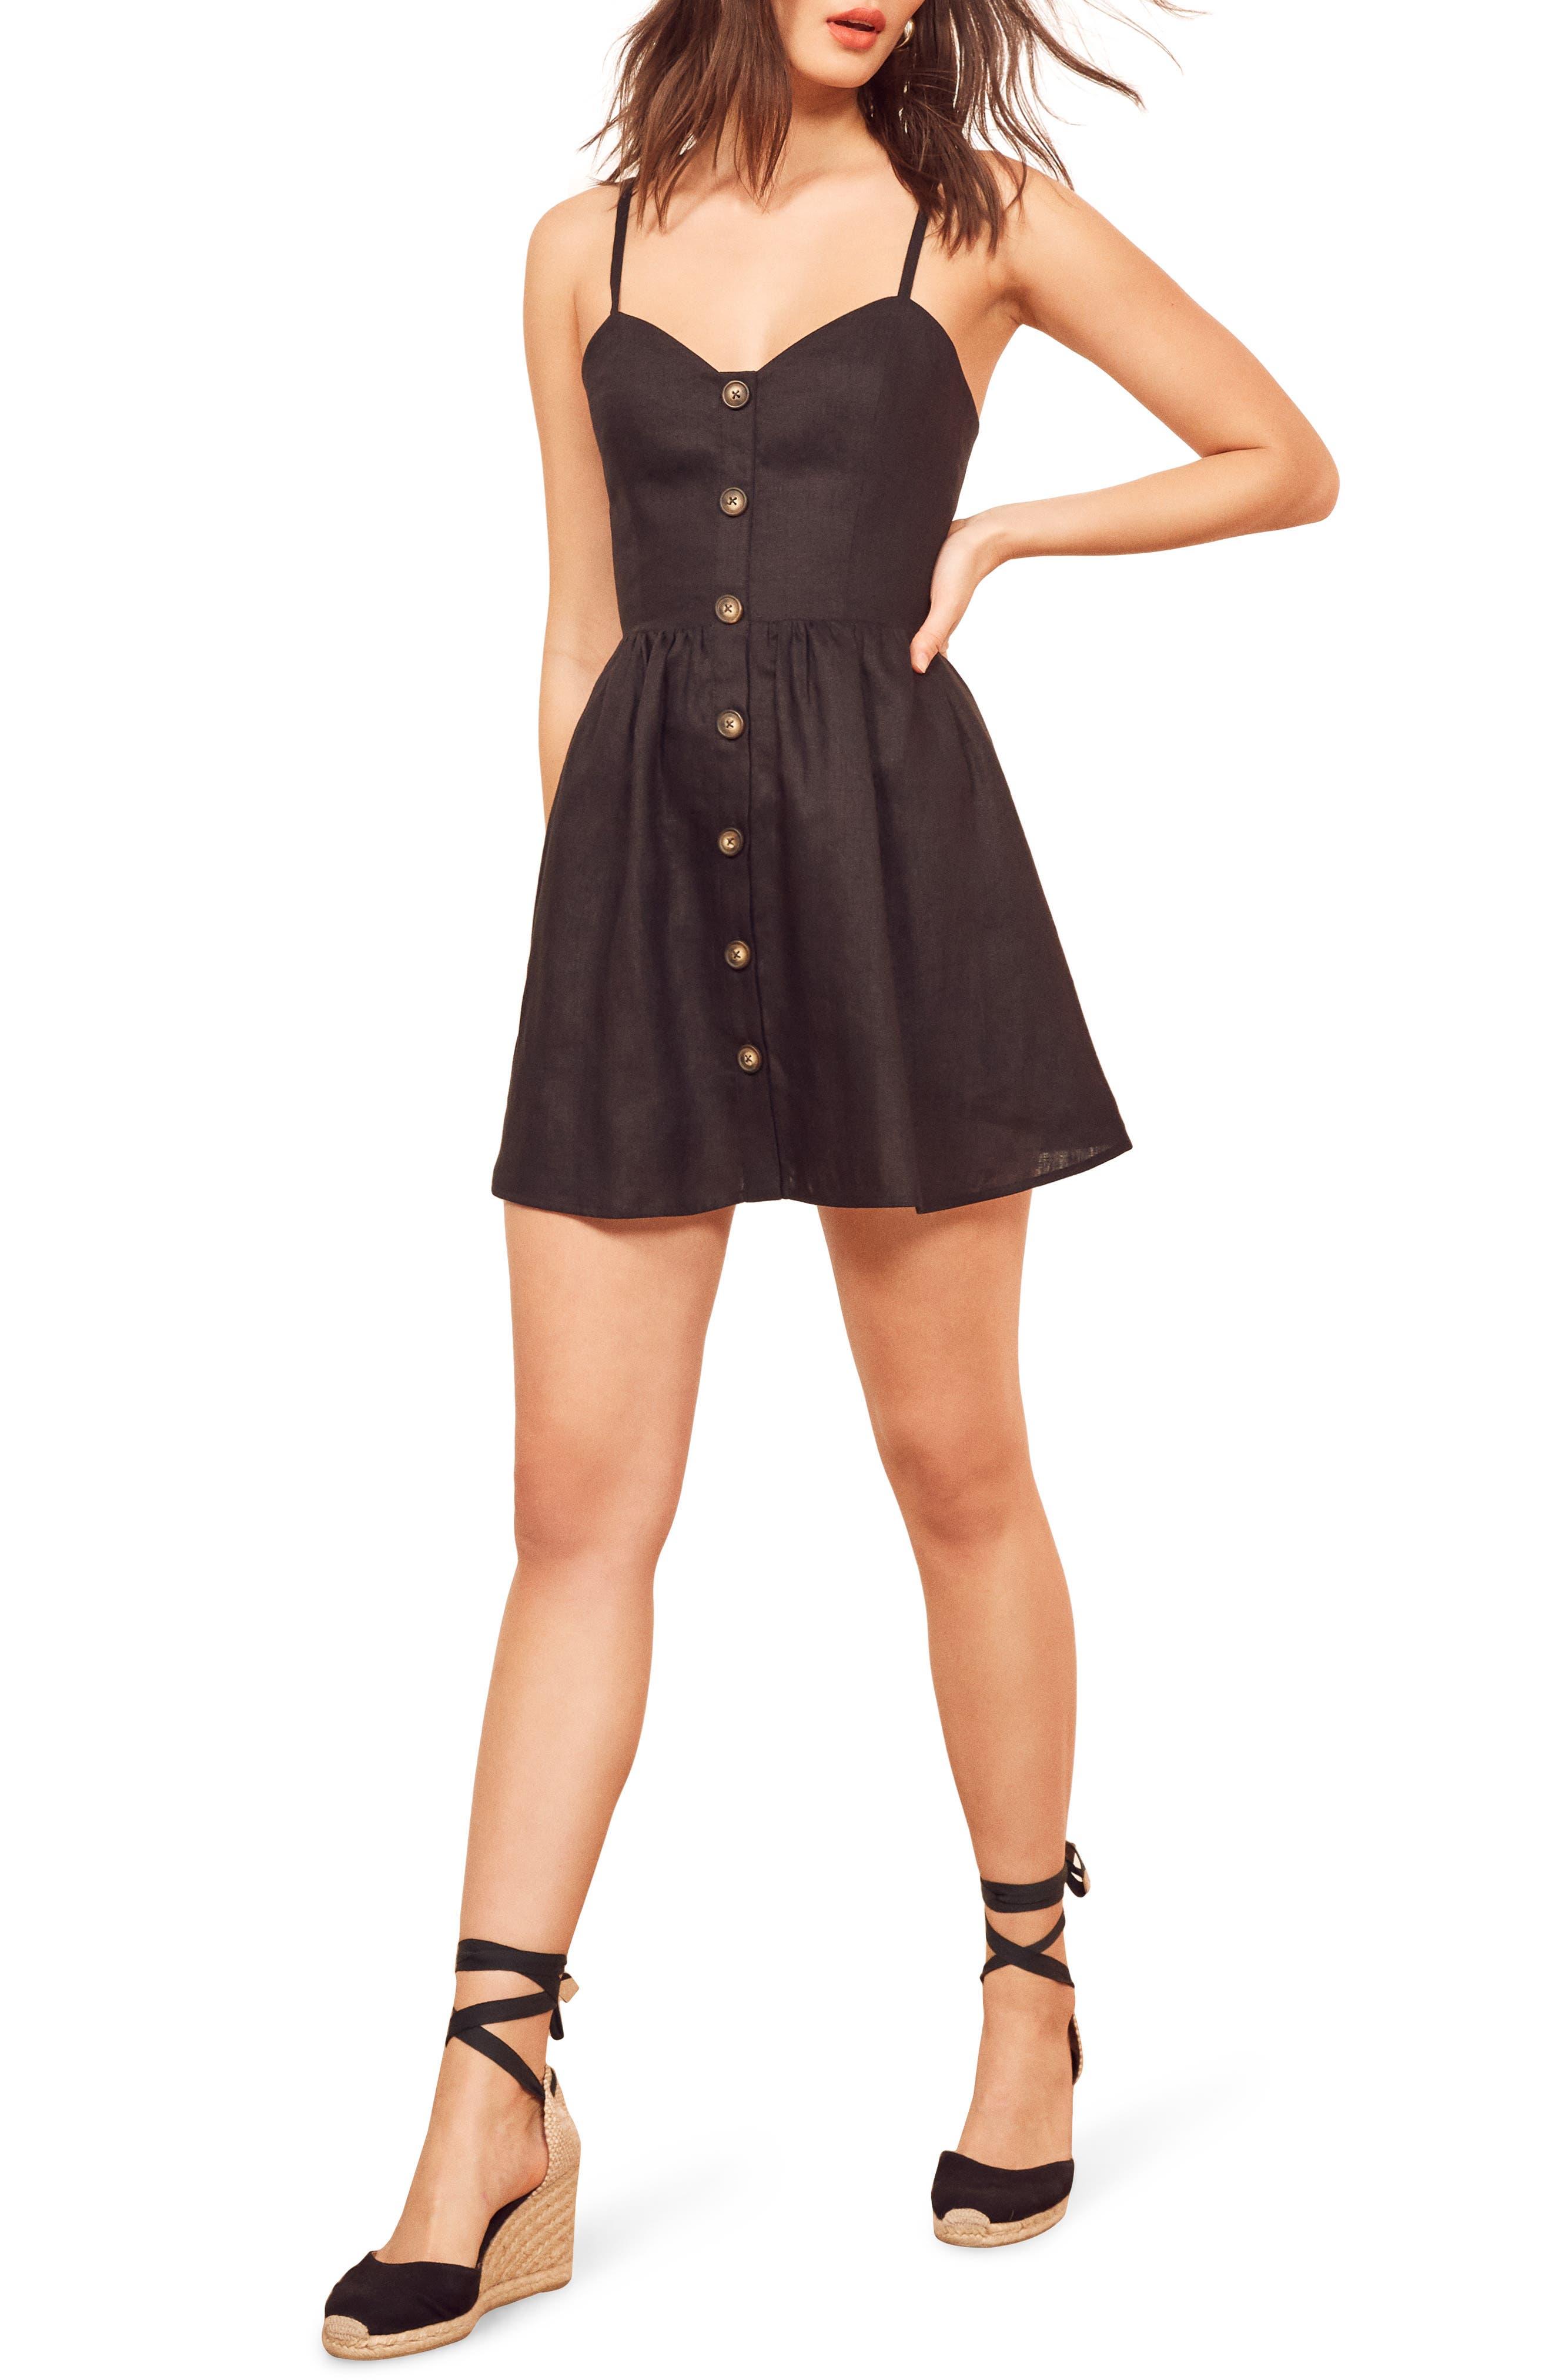 Reformation Velma Sleeveless Minidress, Black